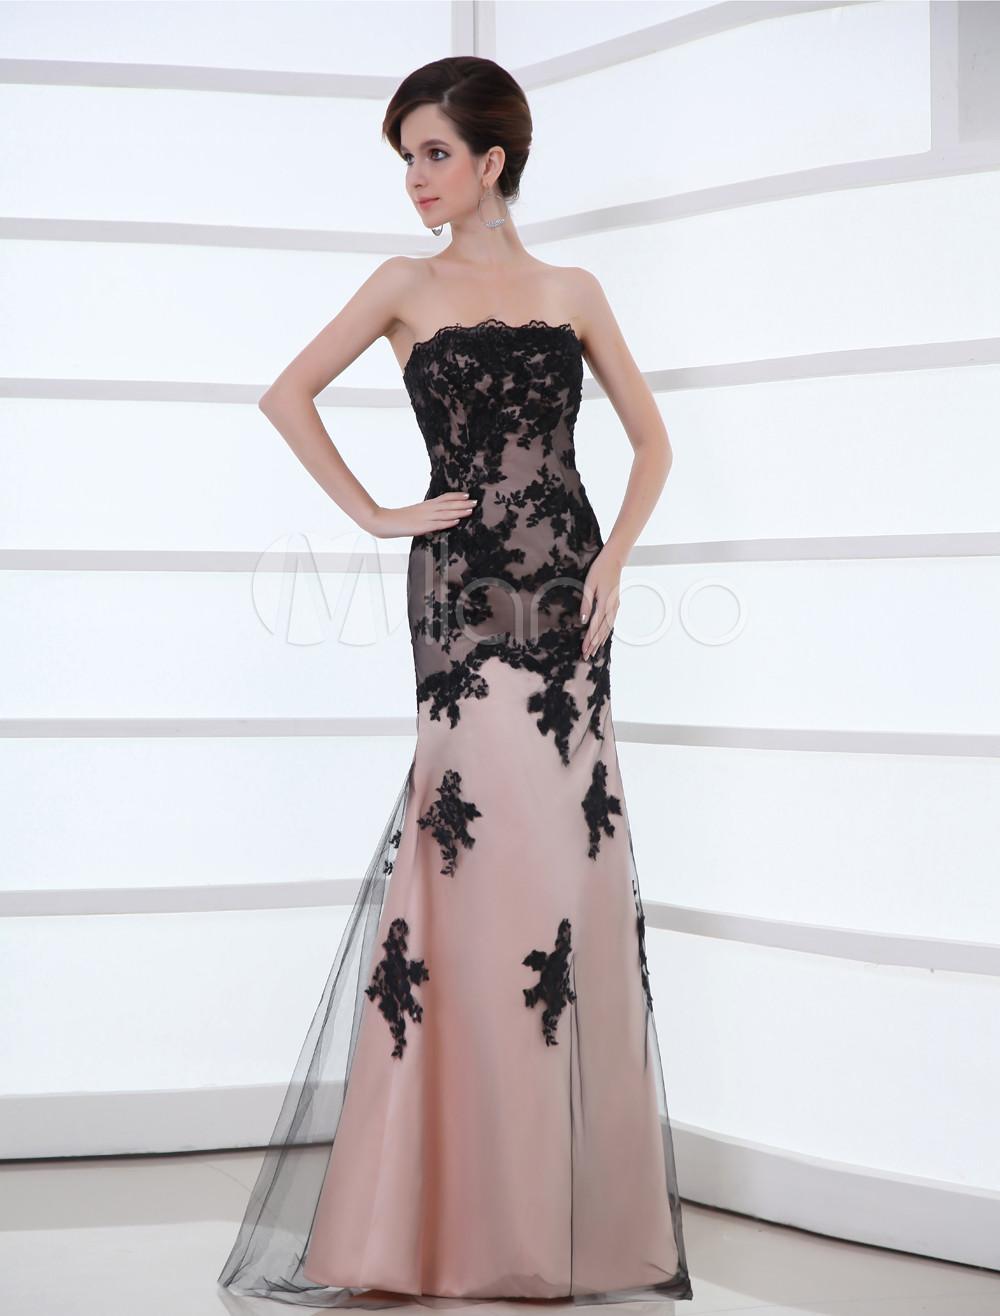 Pink Floral Net Lace Strapless Evening Dress (Wedding Evening Dresses) photo